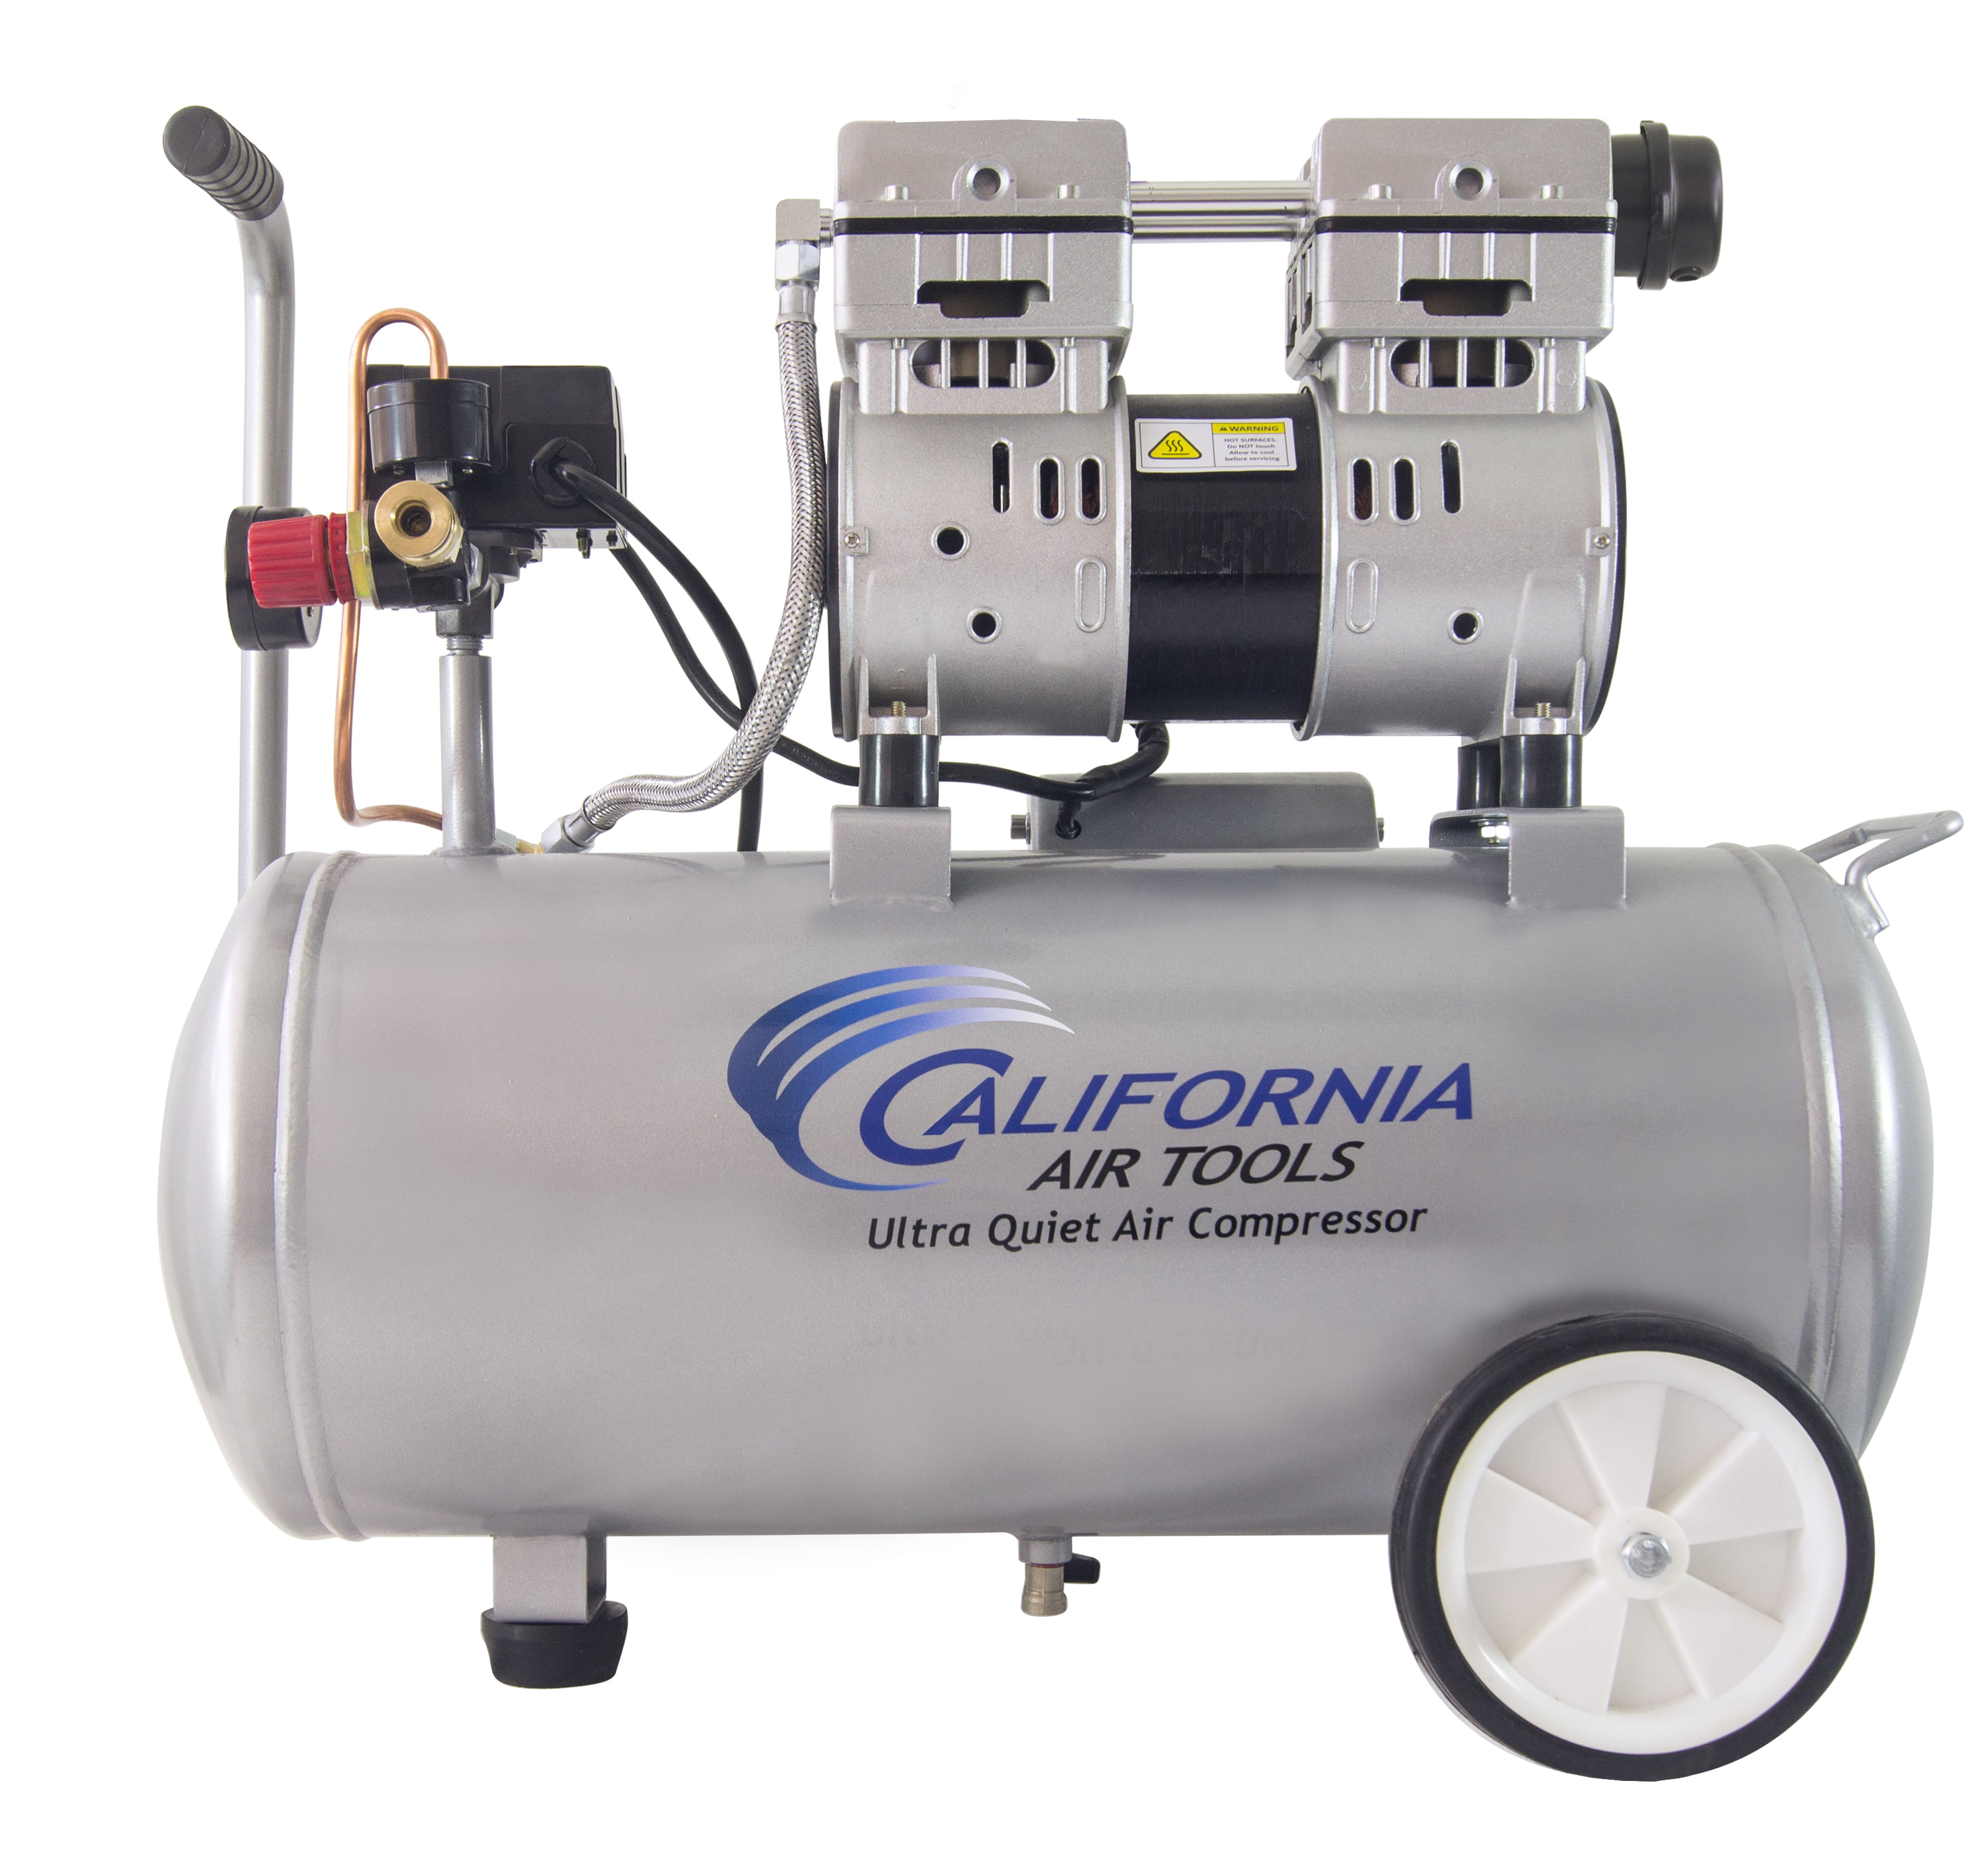 California Air Tools 8010 Ultra Quiet & Oil-Free 1.0 Hp, 8.0 Gal. Steel Tank Air Compressor by California Air Tools